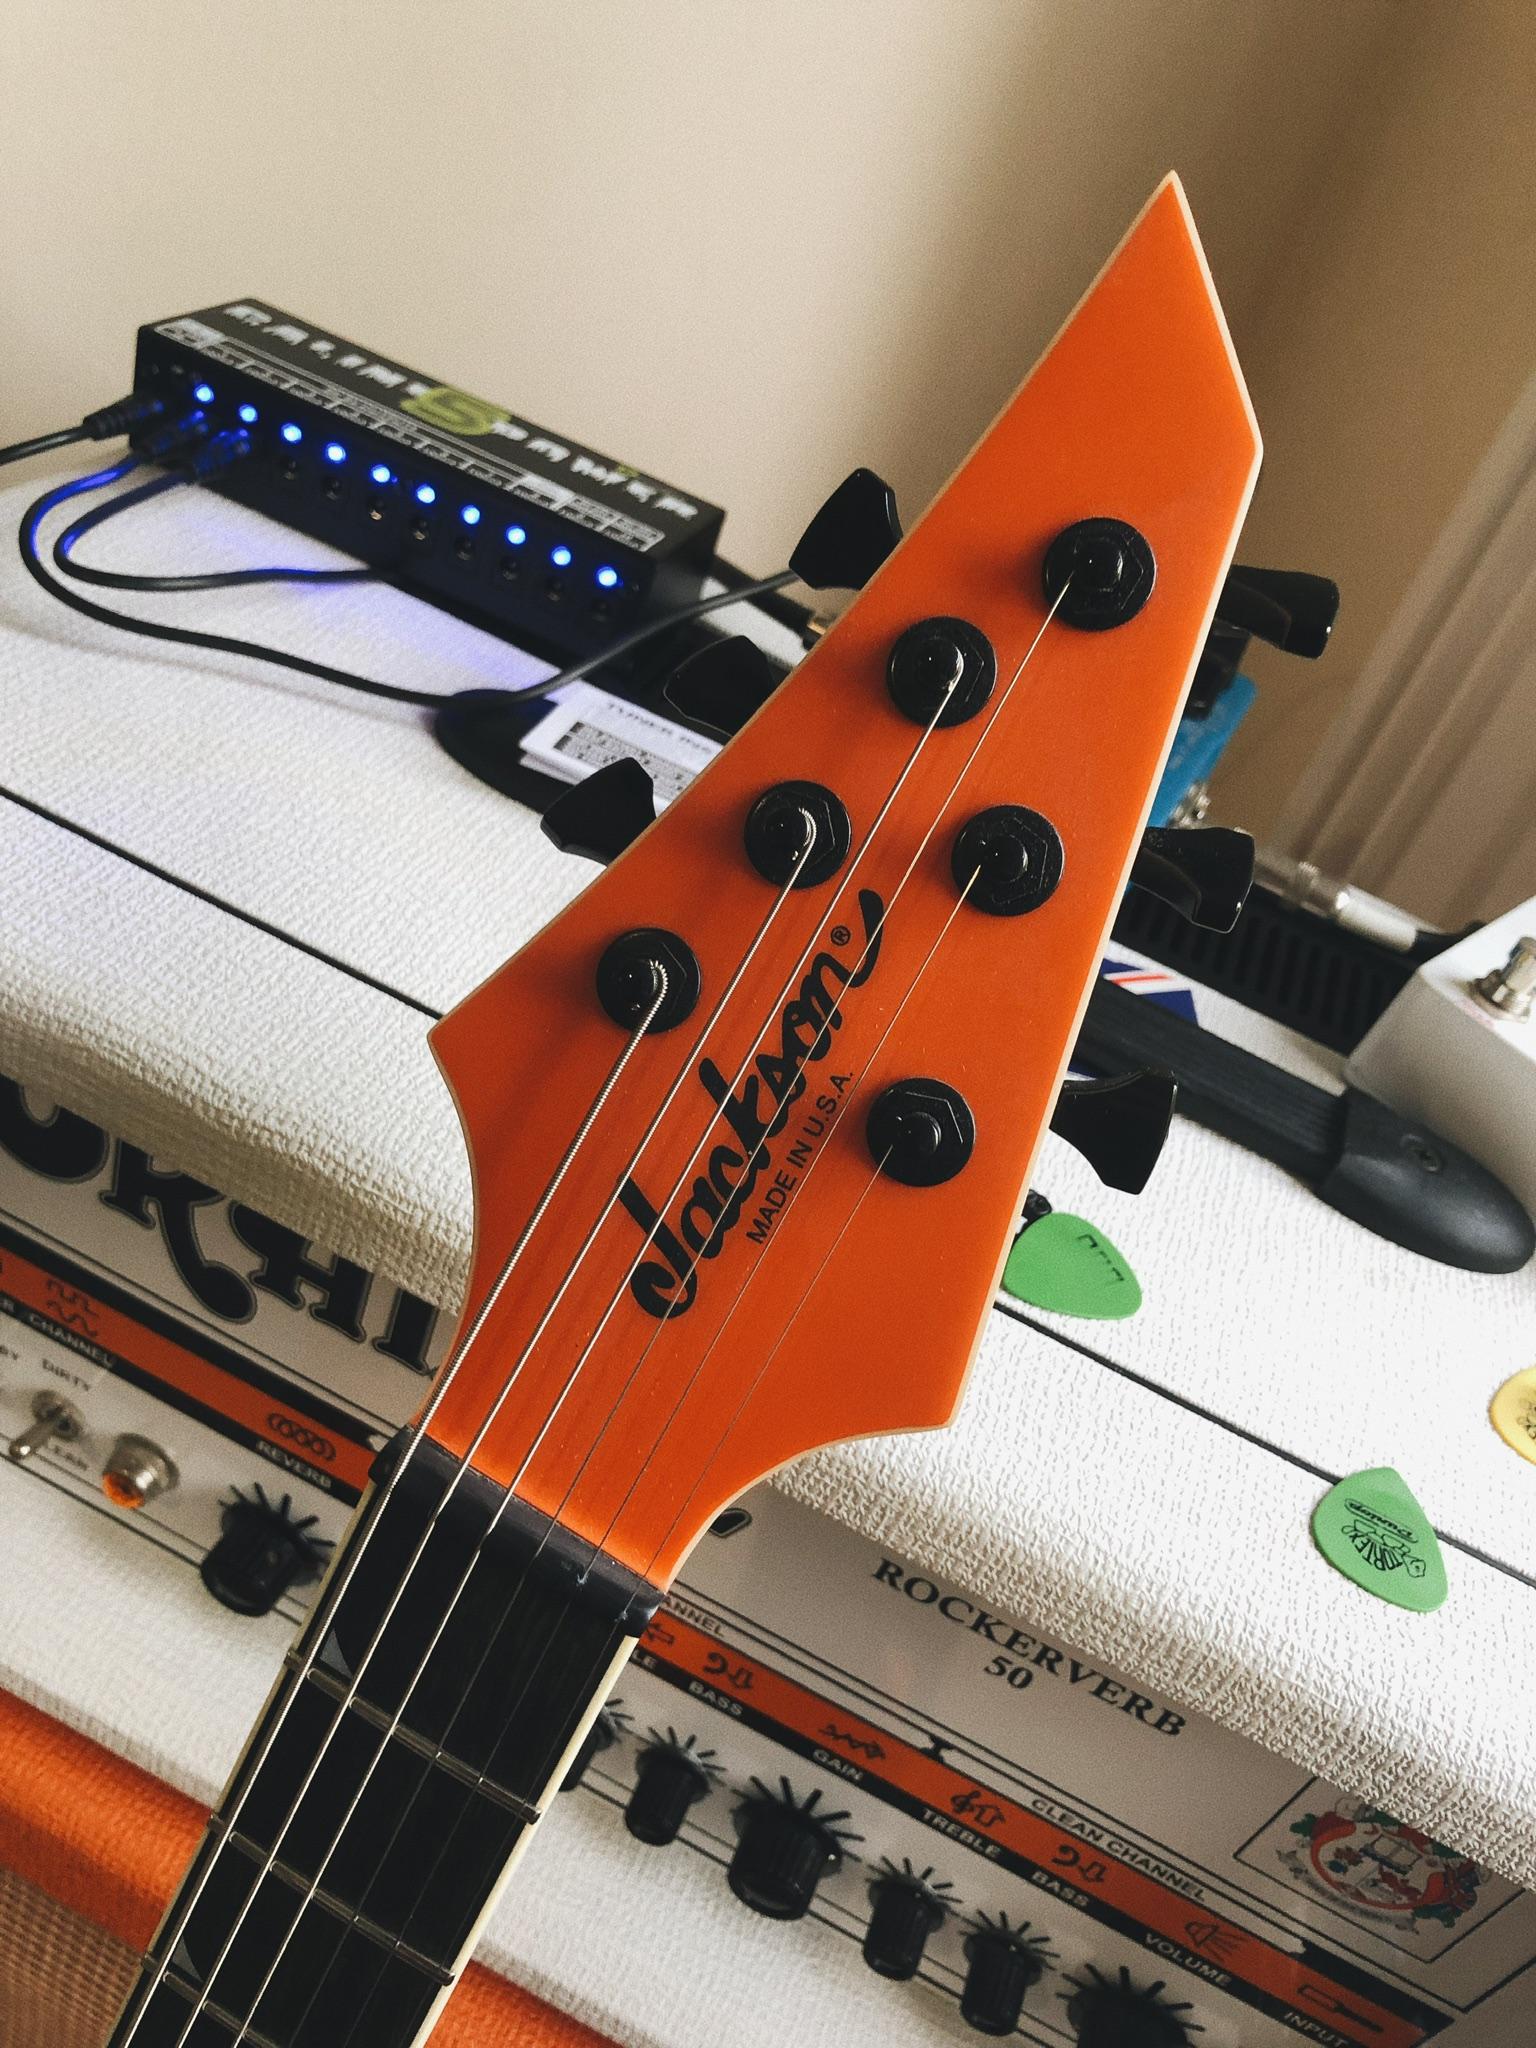 NGD! Jackson USA Juggernaut HT6 in matte lambo orange (backstory included)-eb93f307-e09a-4a1e-a043-dfc7b038e25d-jpeg